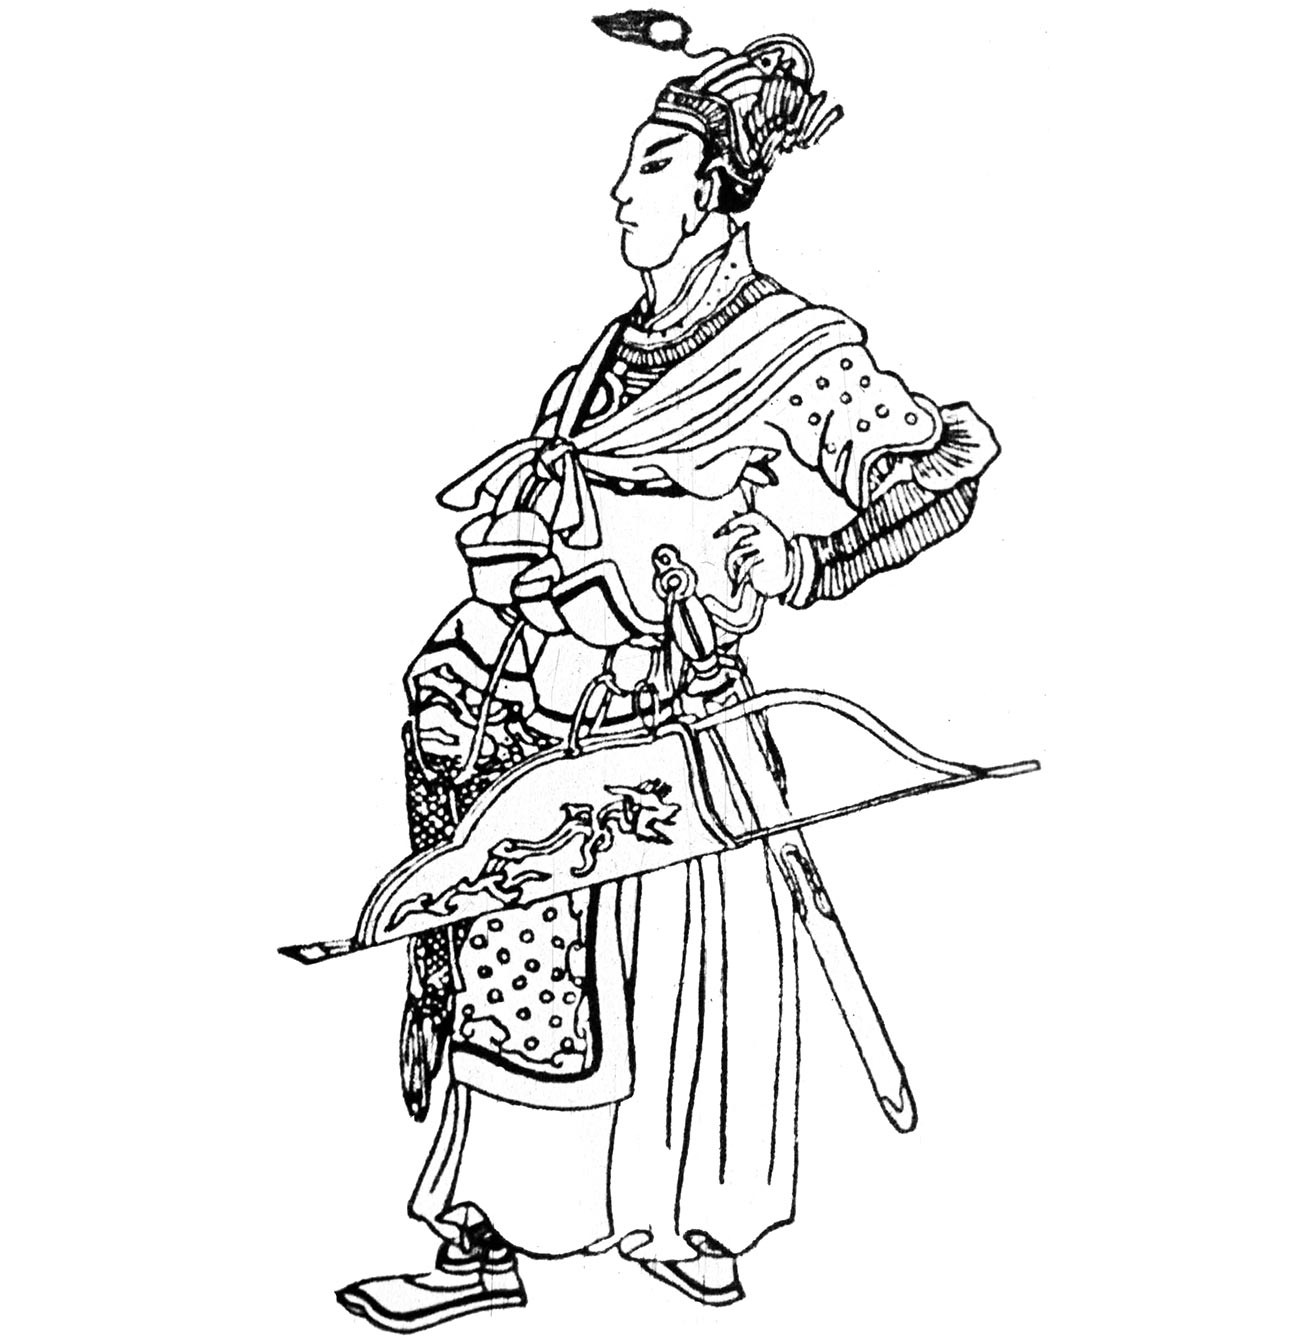 Бату-кан. Средњовековни кинески цртеж.